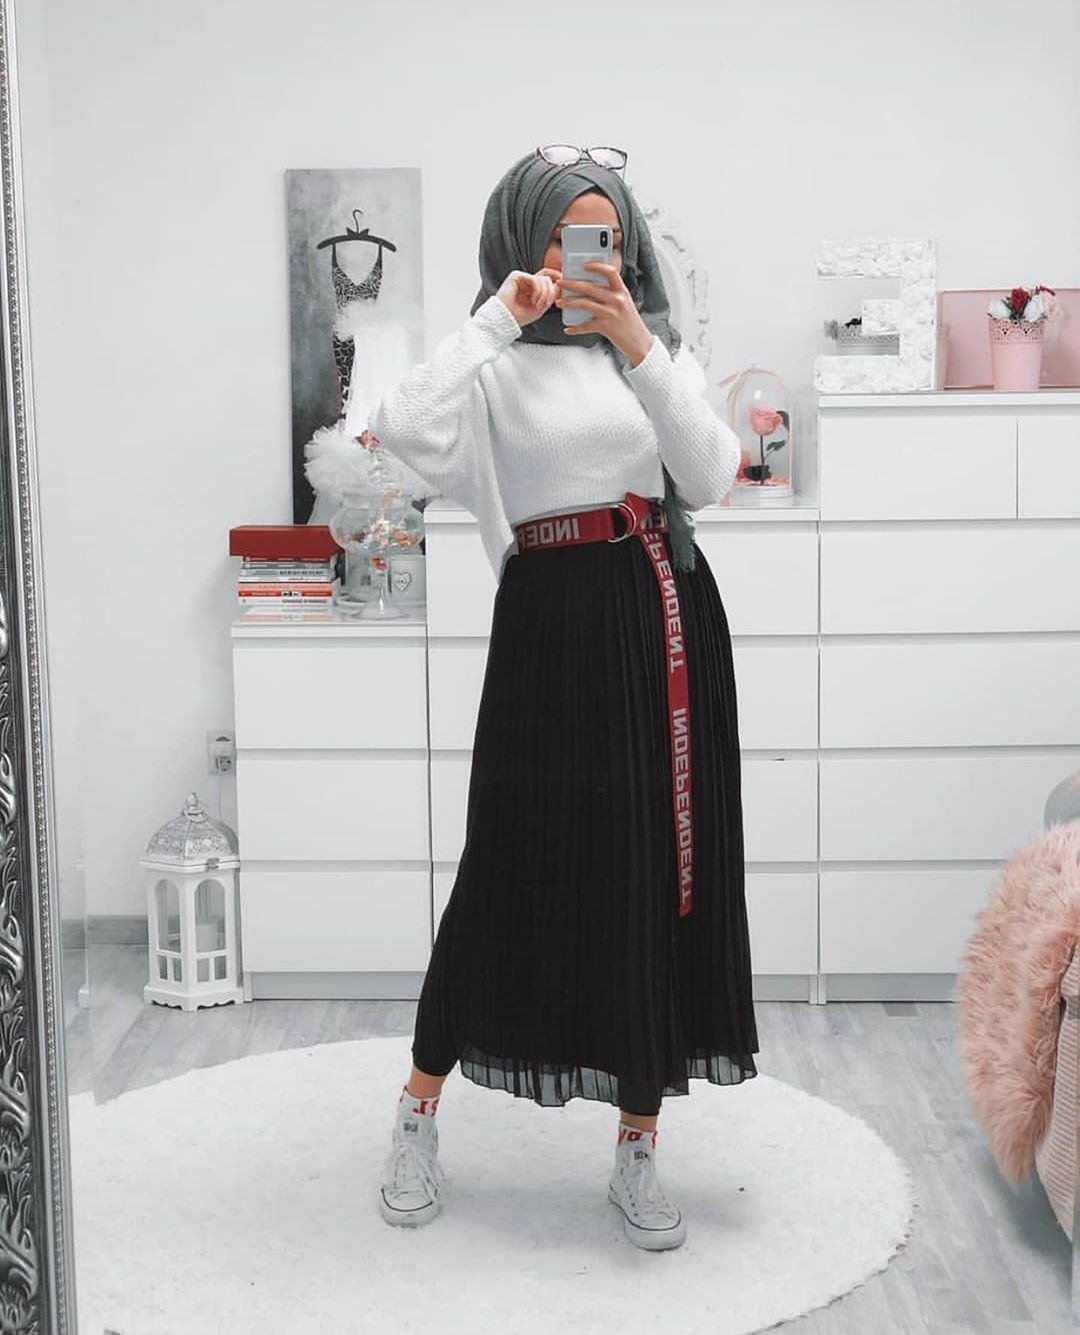 https://rozup.ir/view/2921715/hijab%20-manto-2978%20(1).jpg